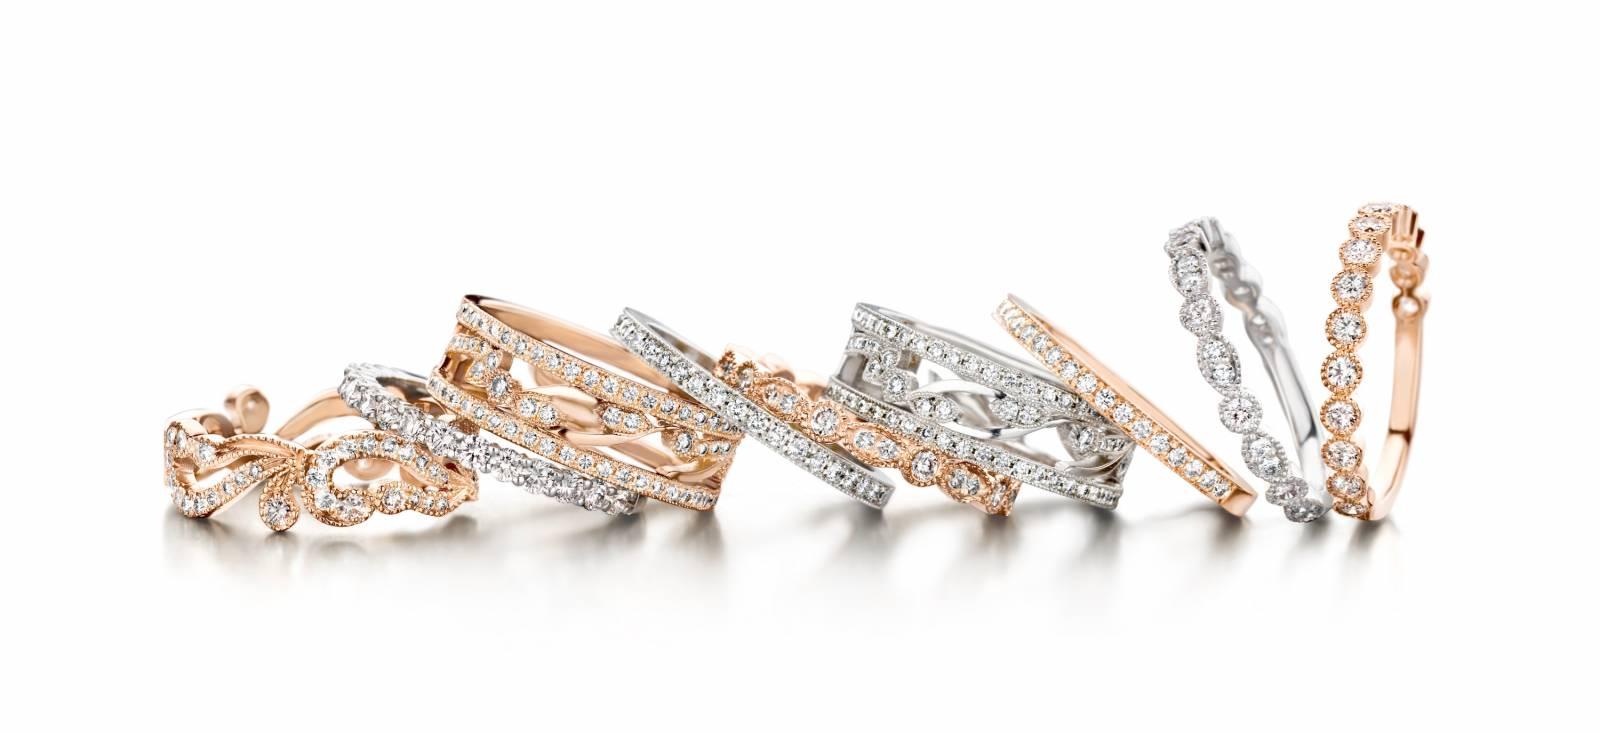 Juwelier Martens - Verlovingsringen - Trouwringen - Juwelen huwelijk - House of Weddings - 3